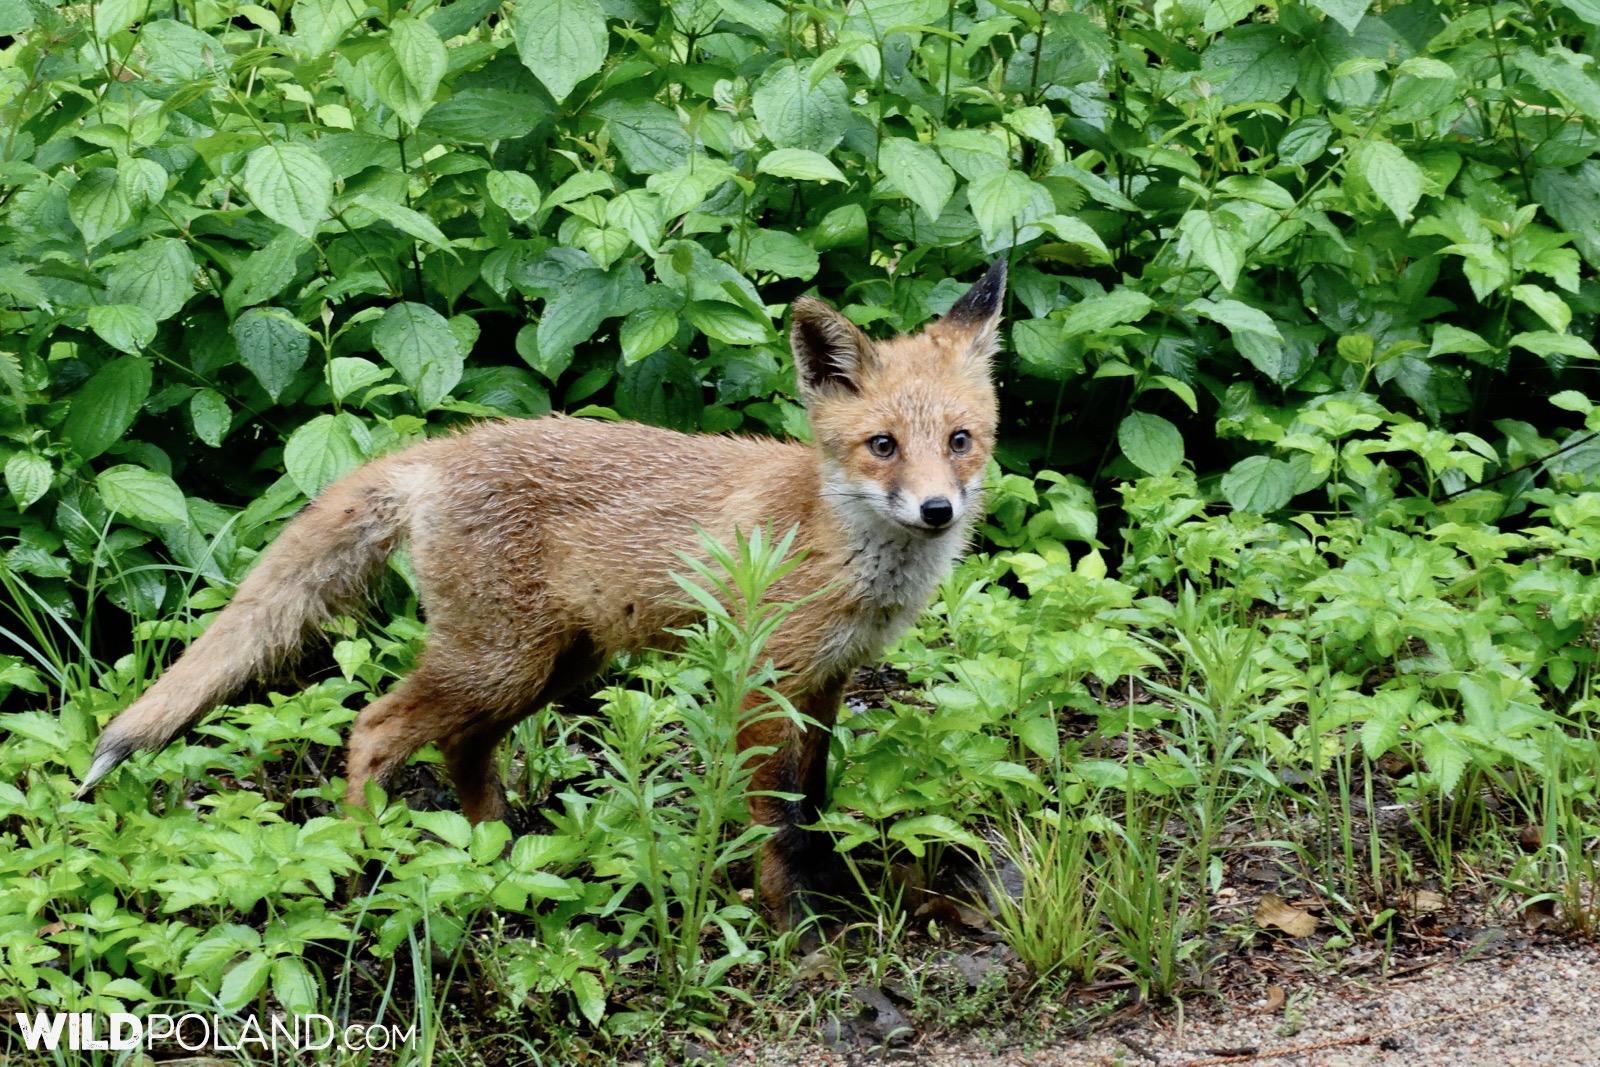 Curious red fox checking on Wild Poland group, photo by Piotr Dębowski